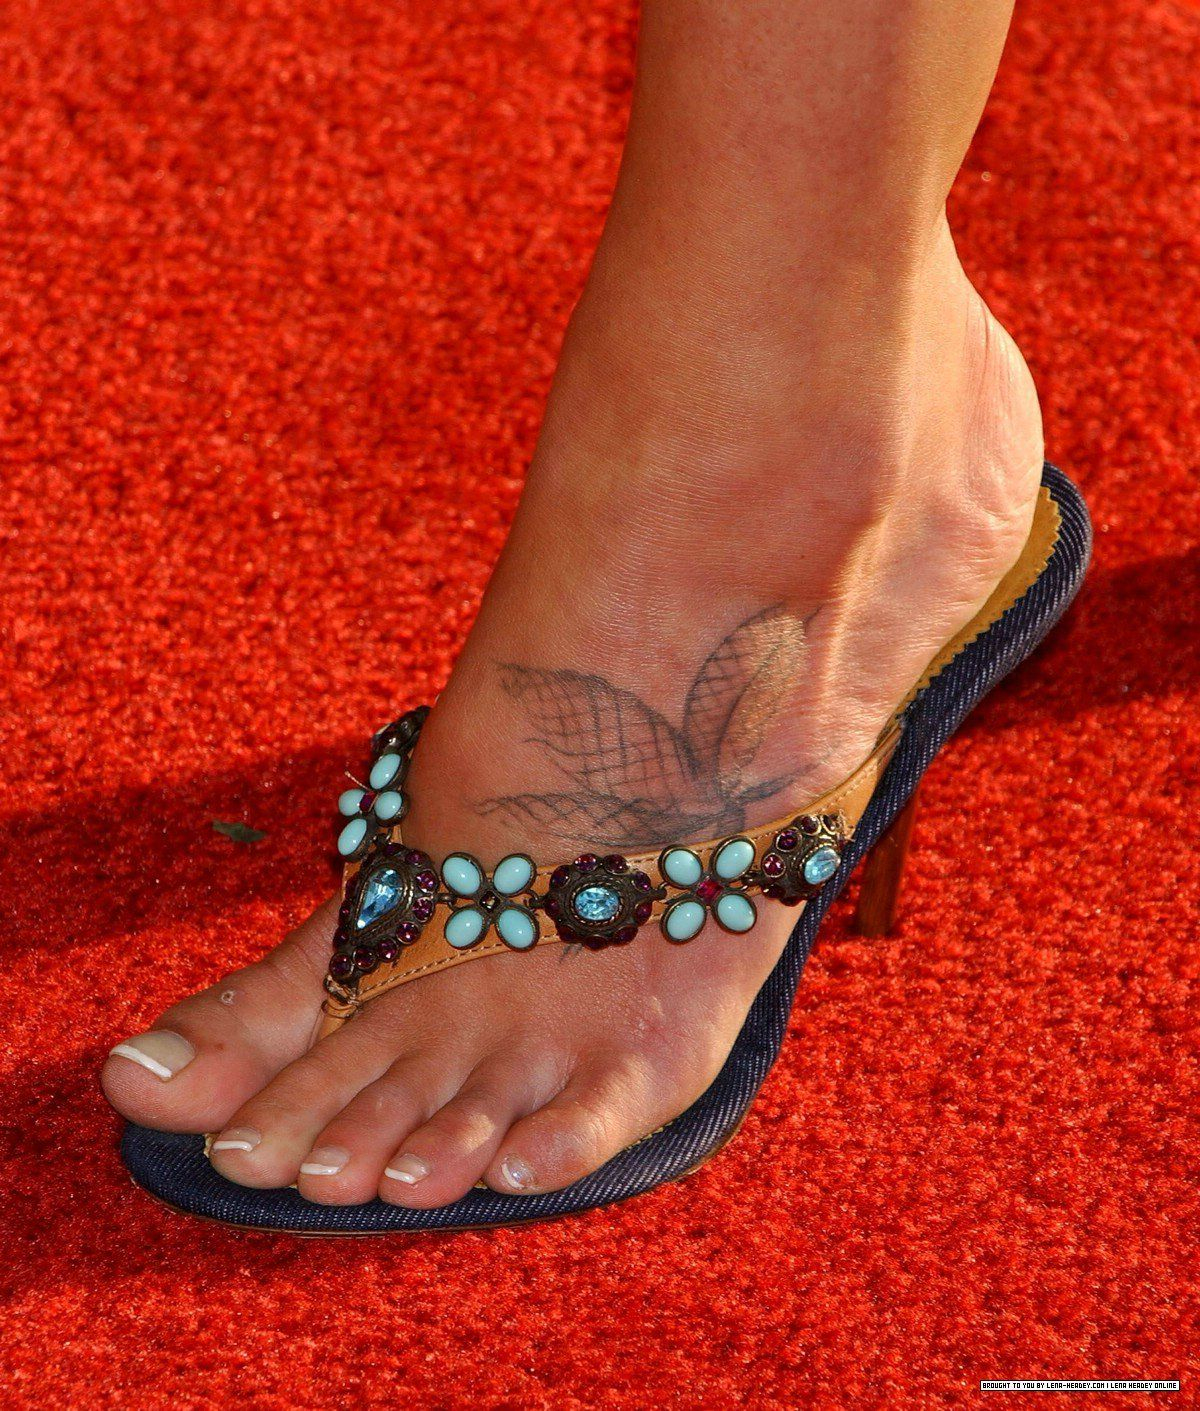 Janelle Monae's Feet Wikifeet